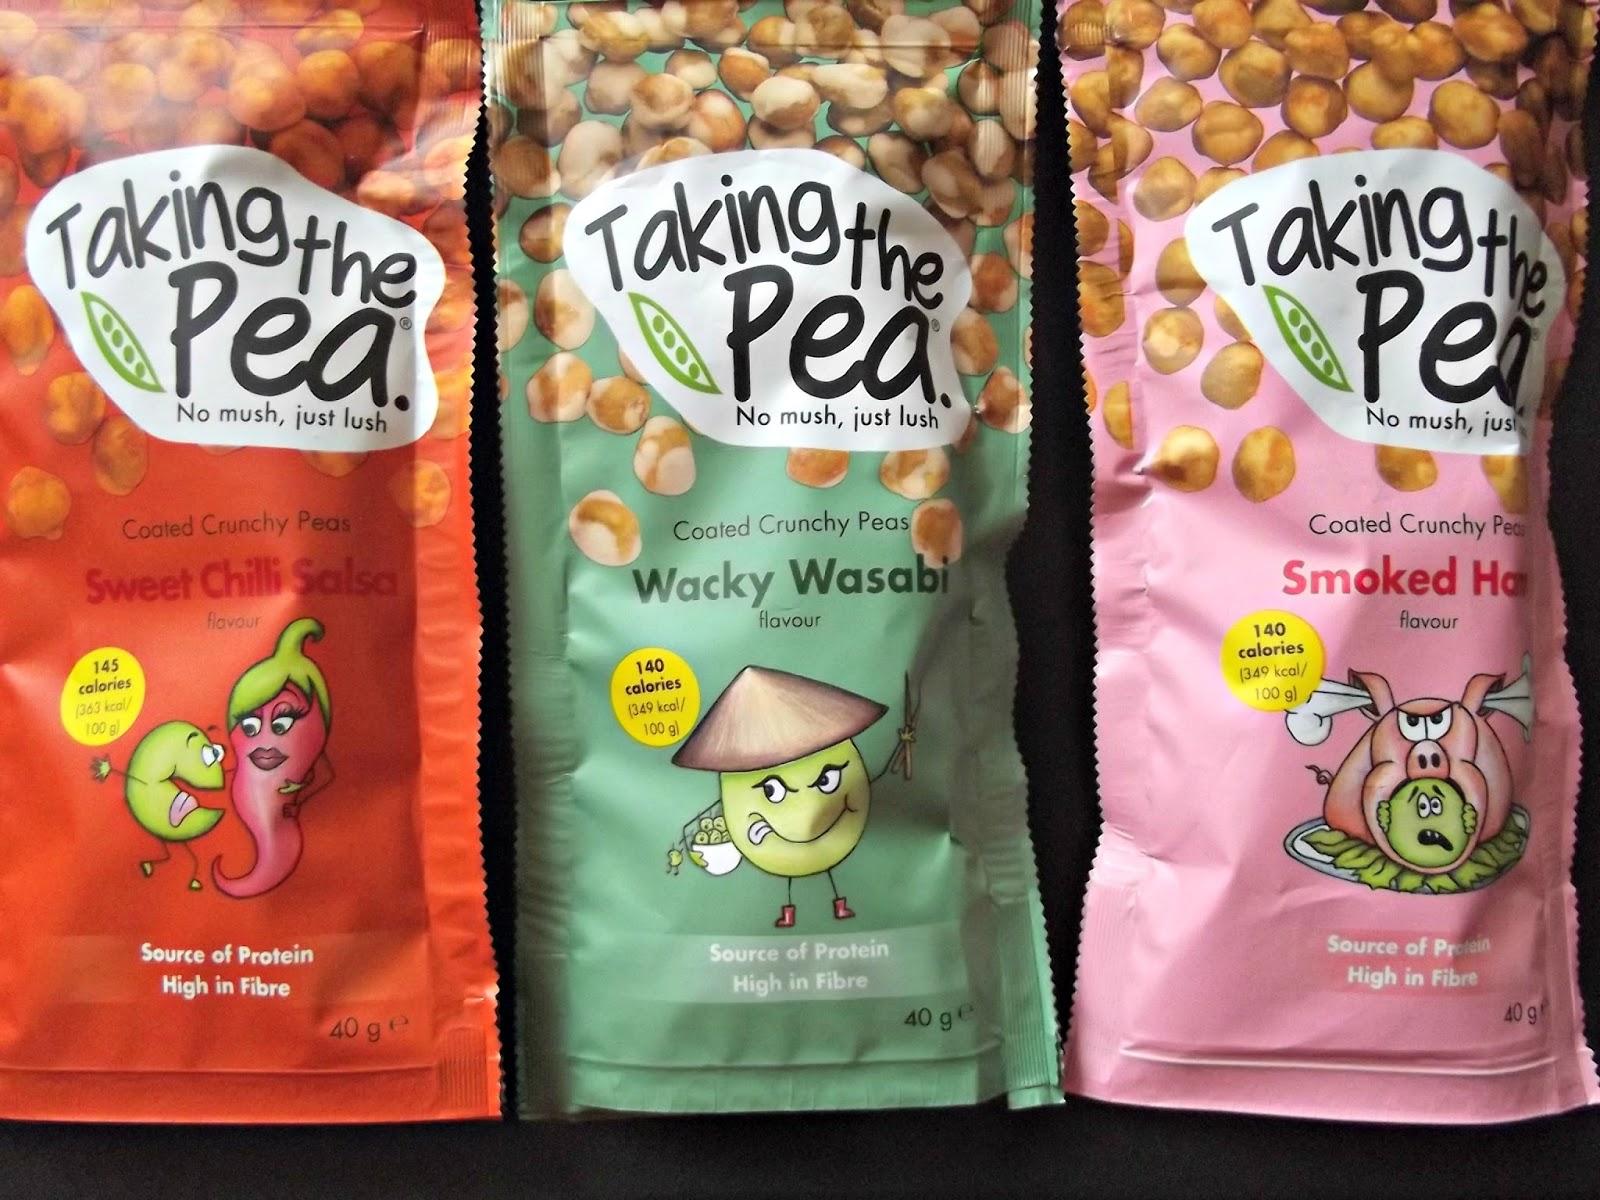 Taking the Pea coated crunchy pea snacks